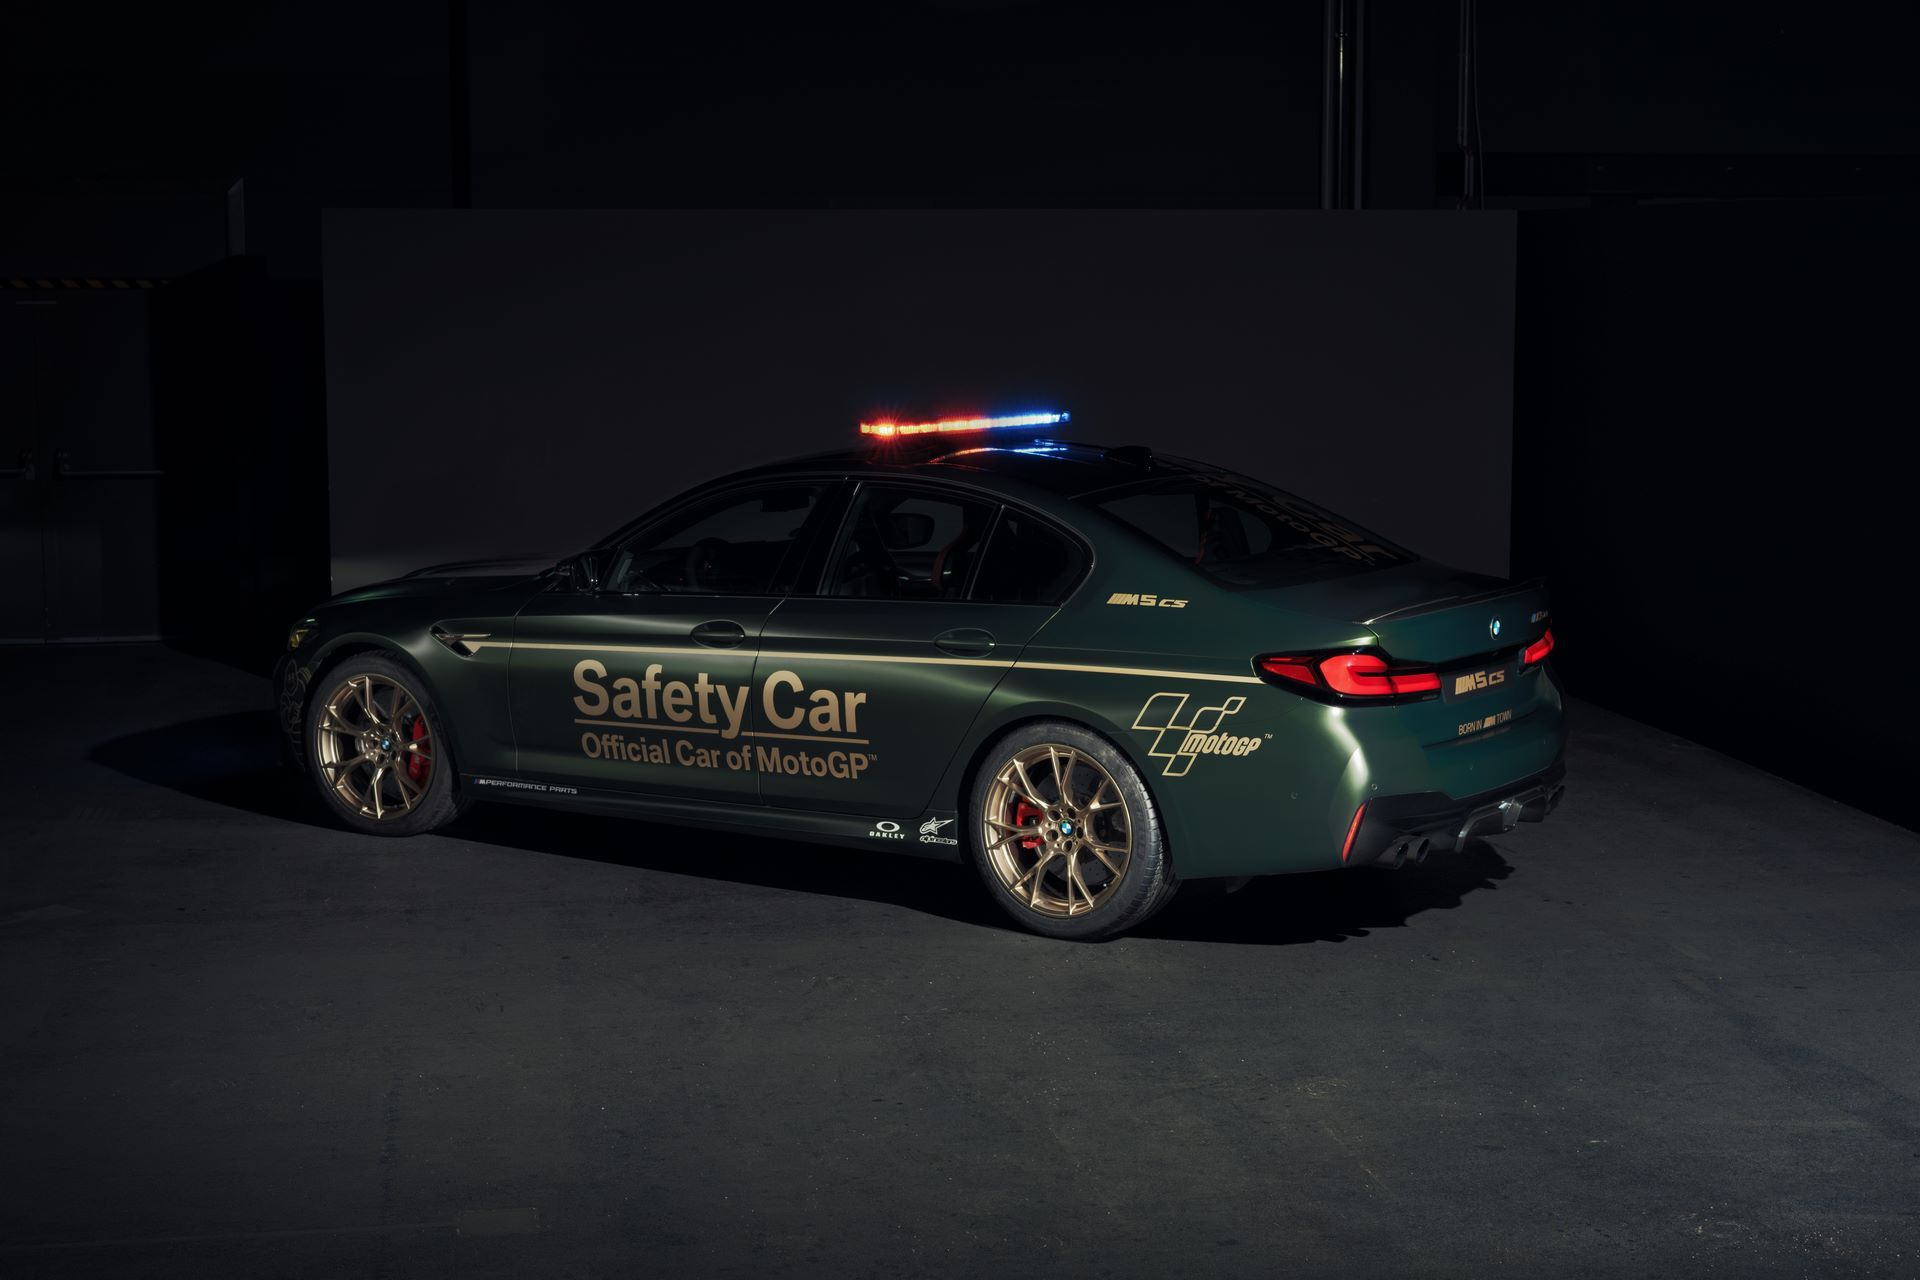 BMW-M3-M4-M5-CS-Safety-Cars-moto-gp-motogp-13